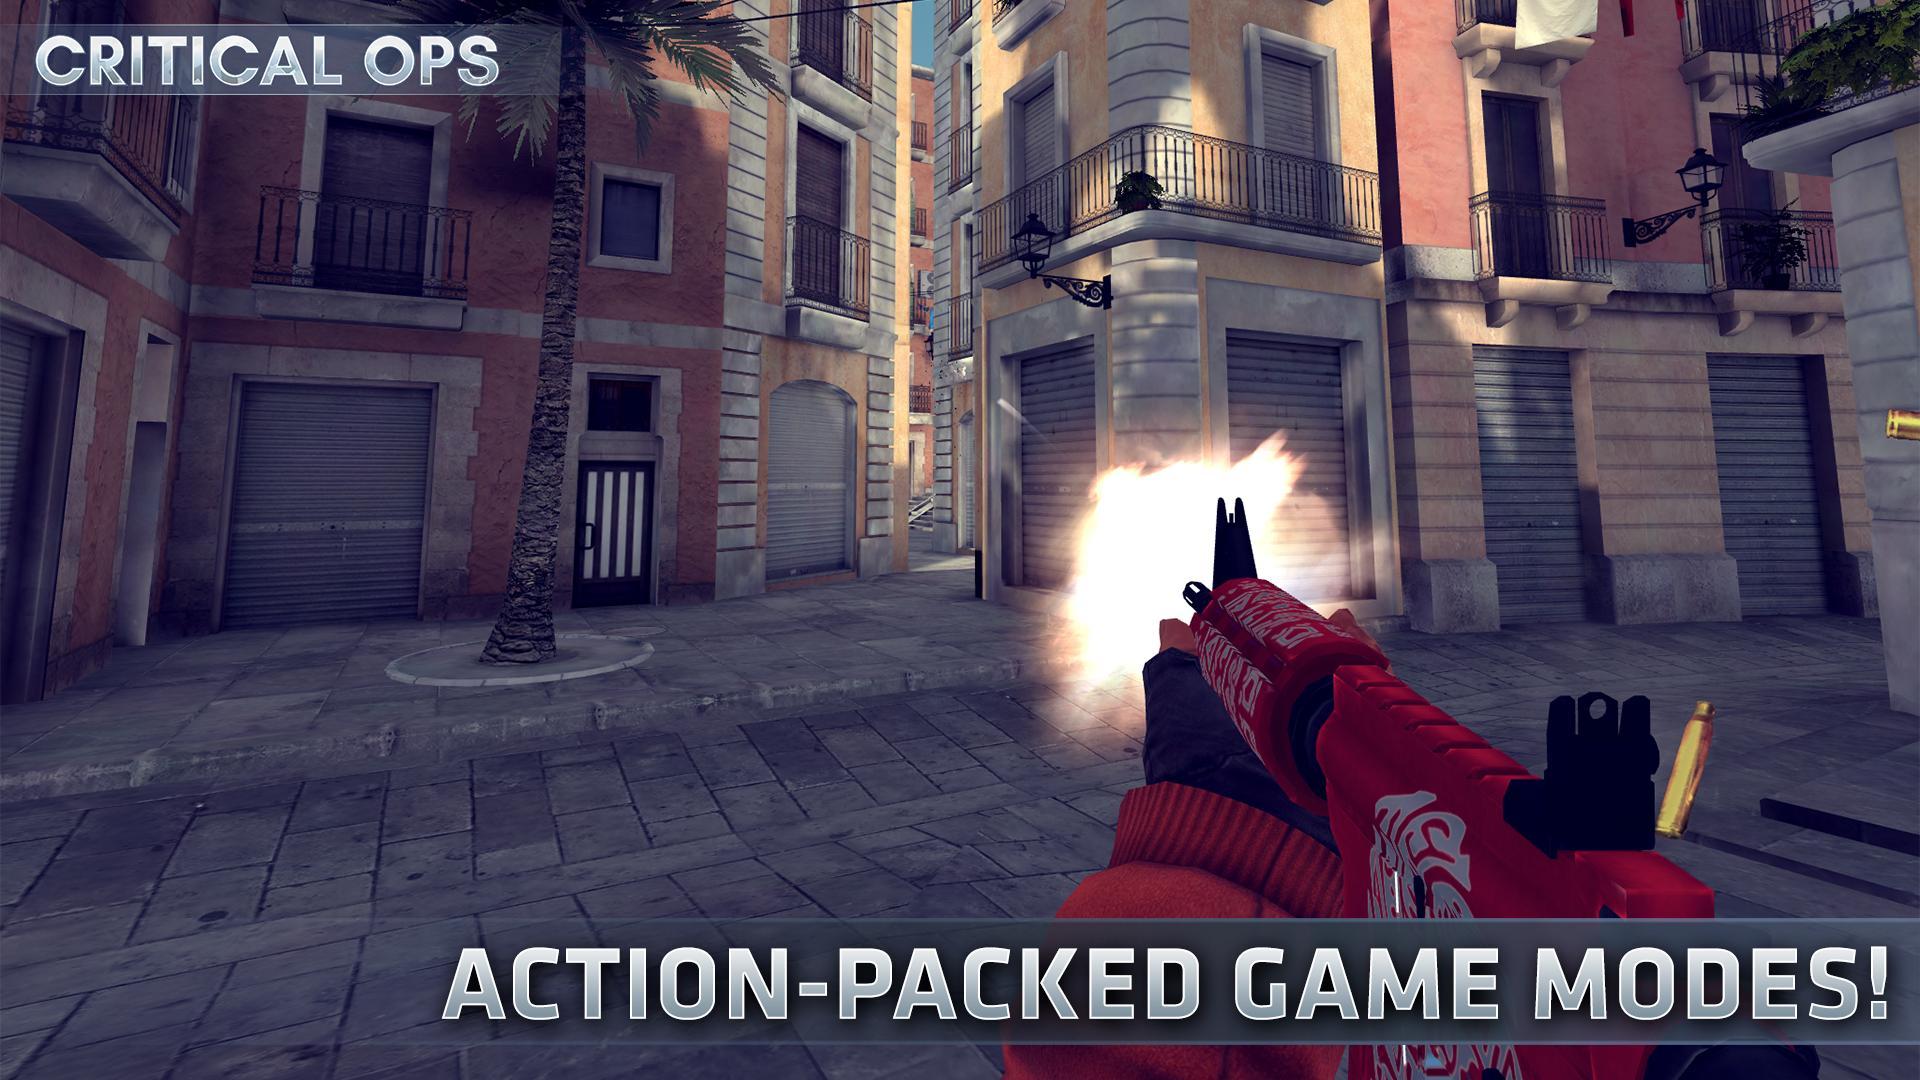 Critical Ops Multiplayer FPS 1.21.0.f1253 Screenshot 3